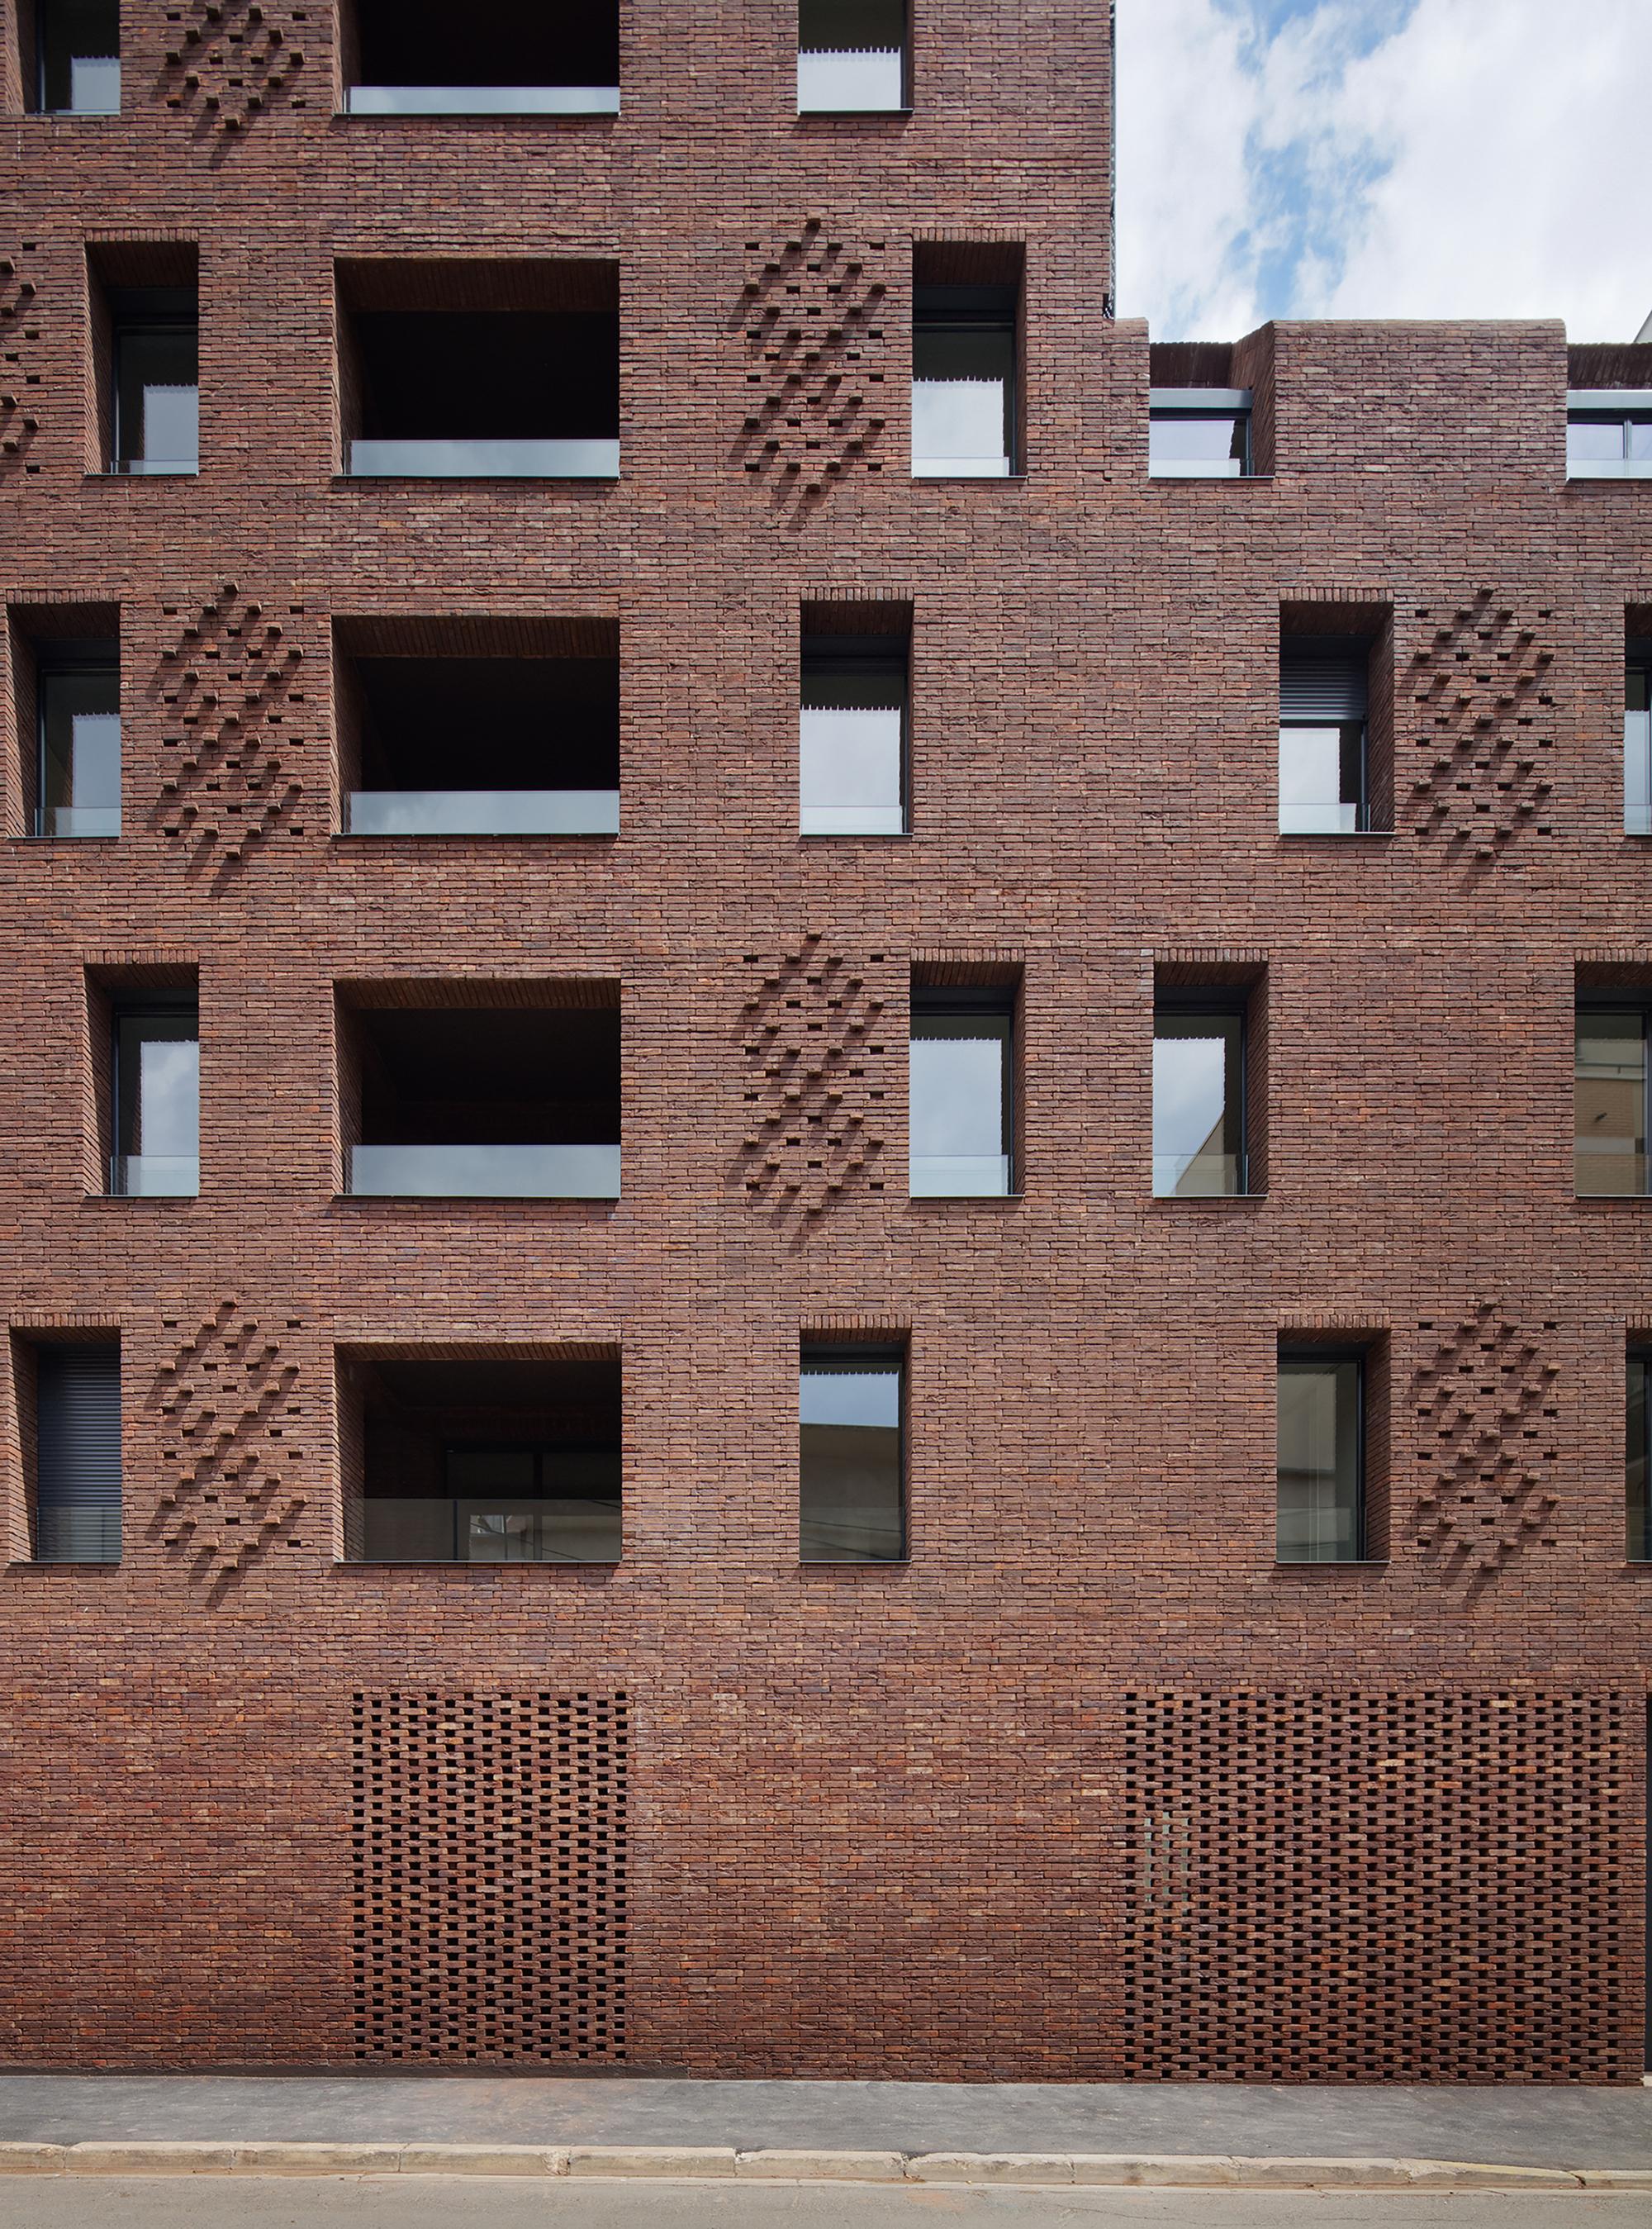 gallery of 38 social housing avenier cornejo 1. Black Bedroom Furniture Sets. Home Design Ideas